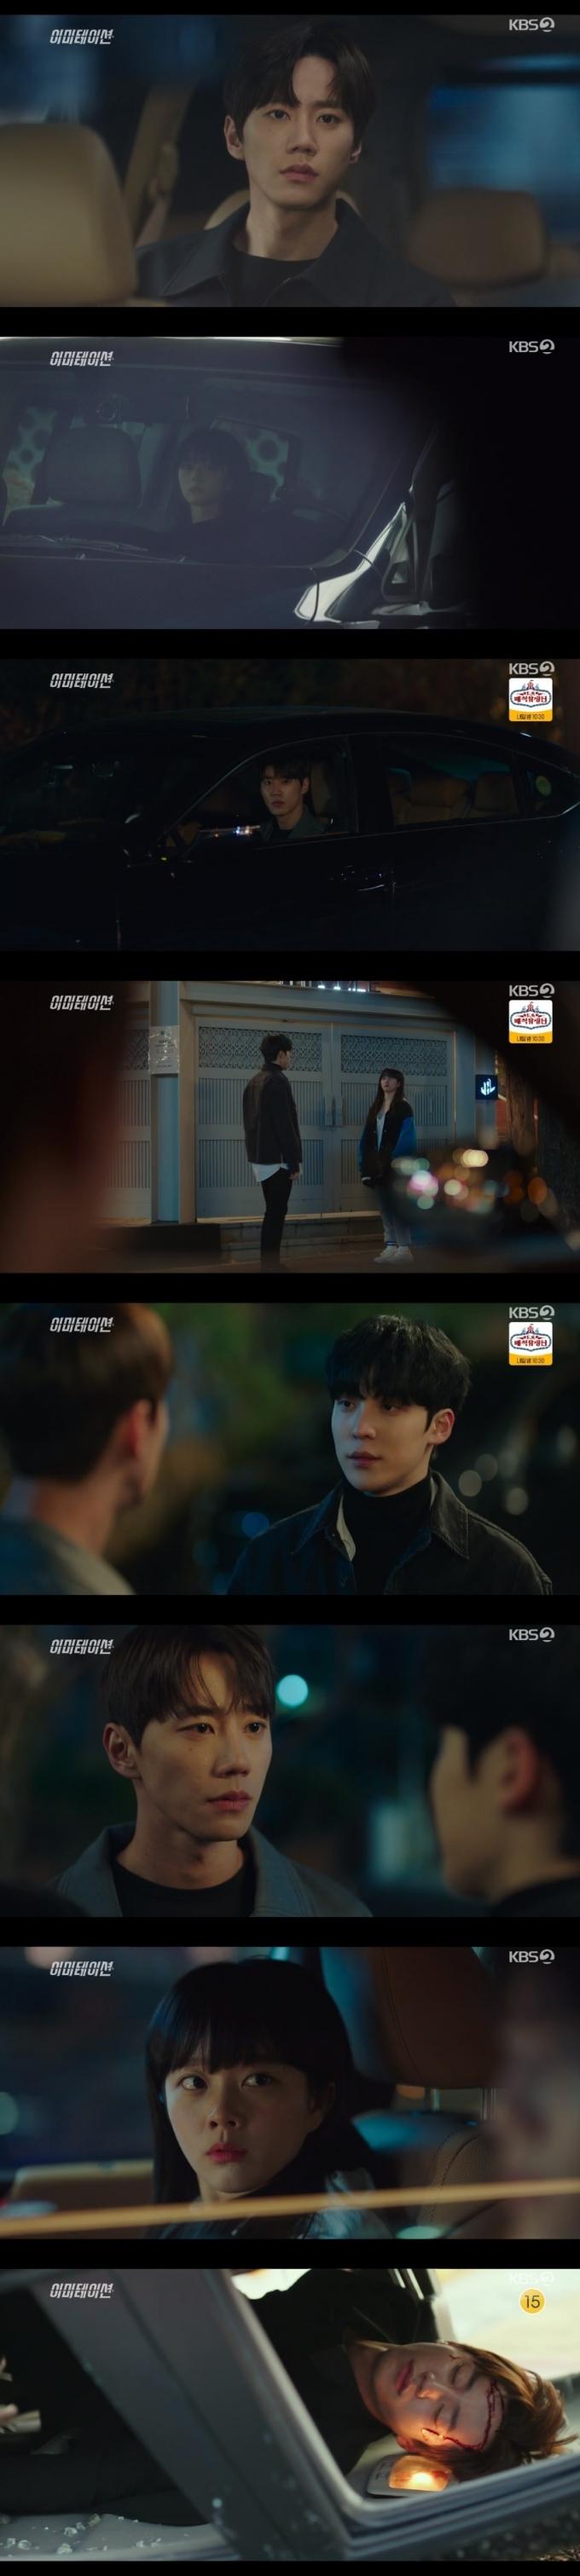 KBS 2TV '이미테이션' 캡처 © 뉴스1